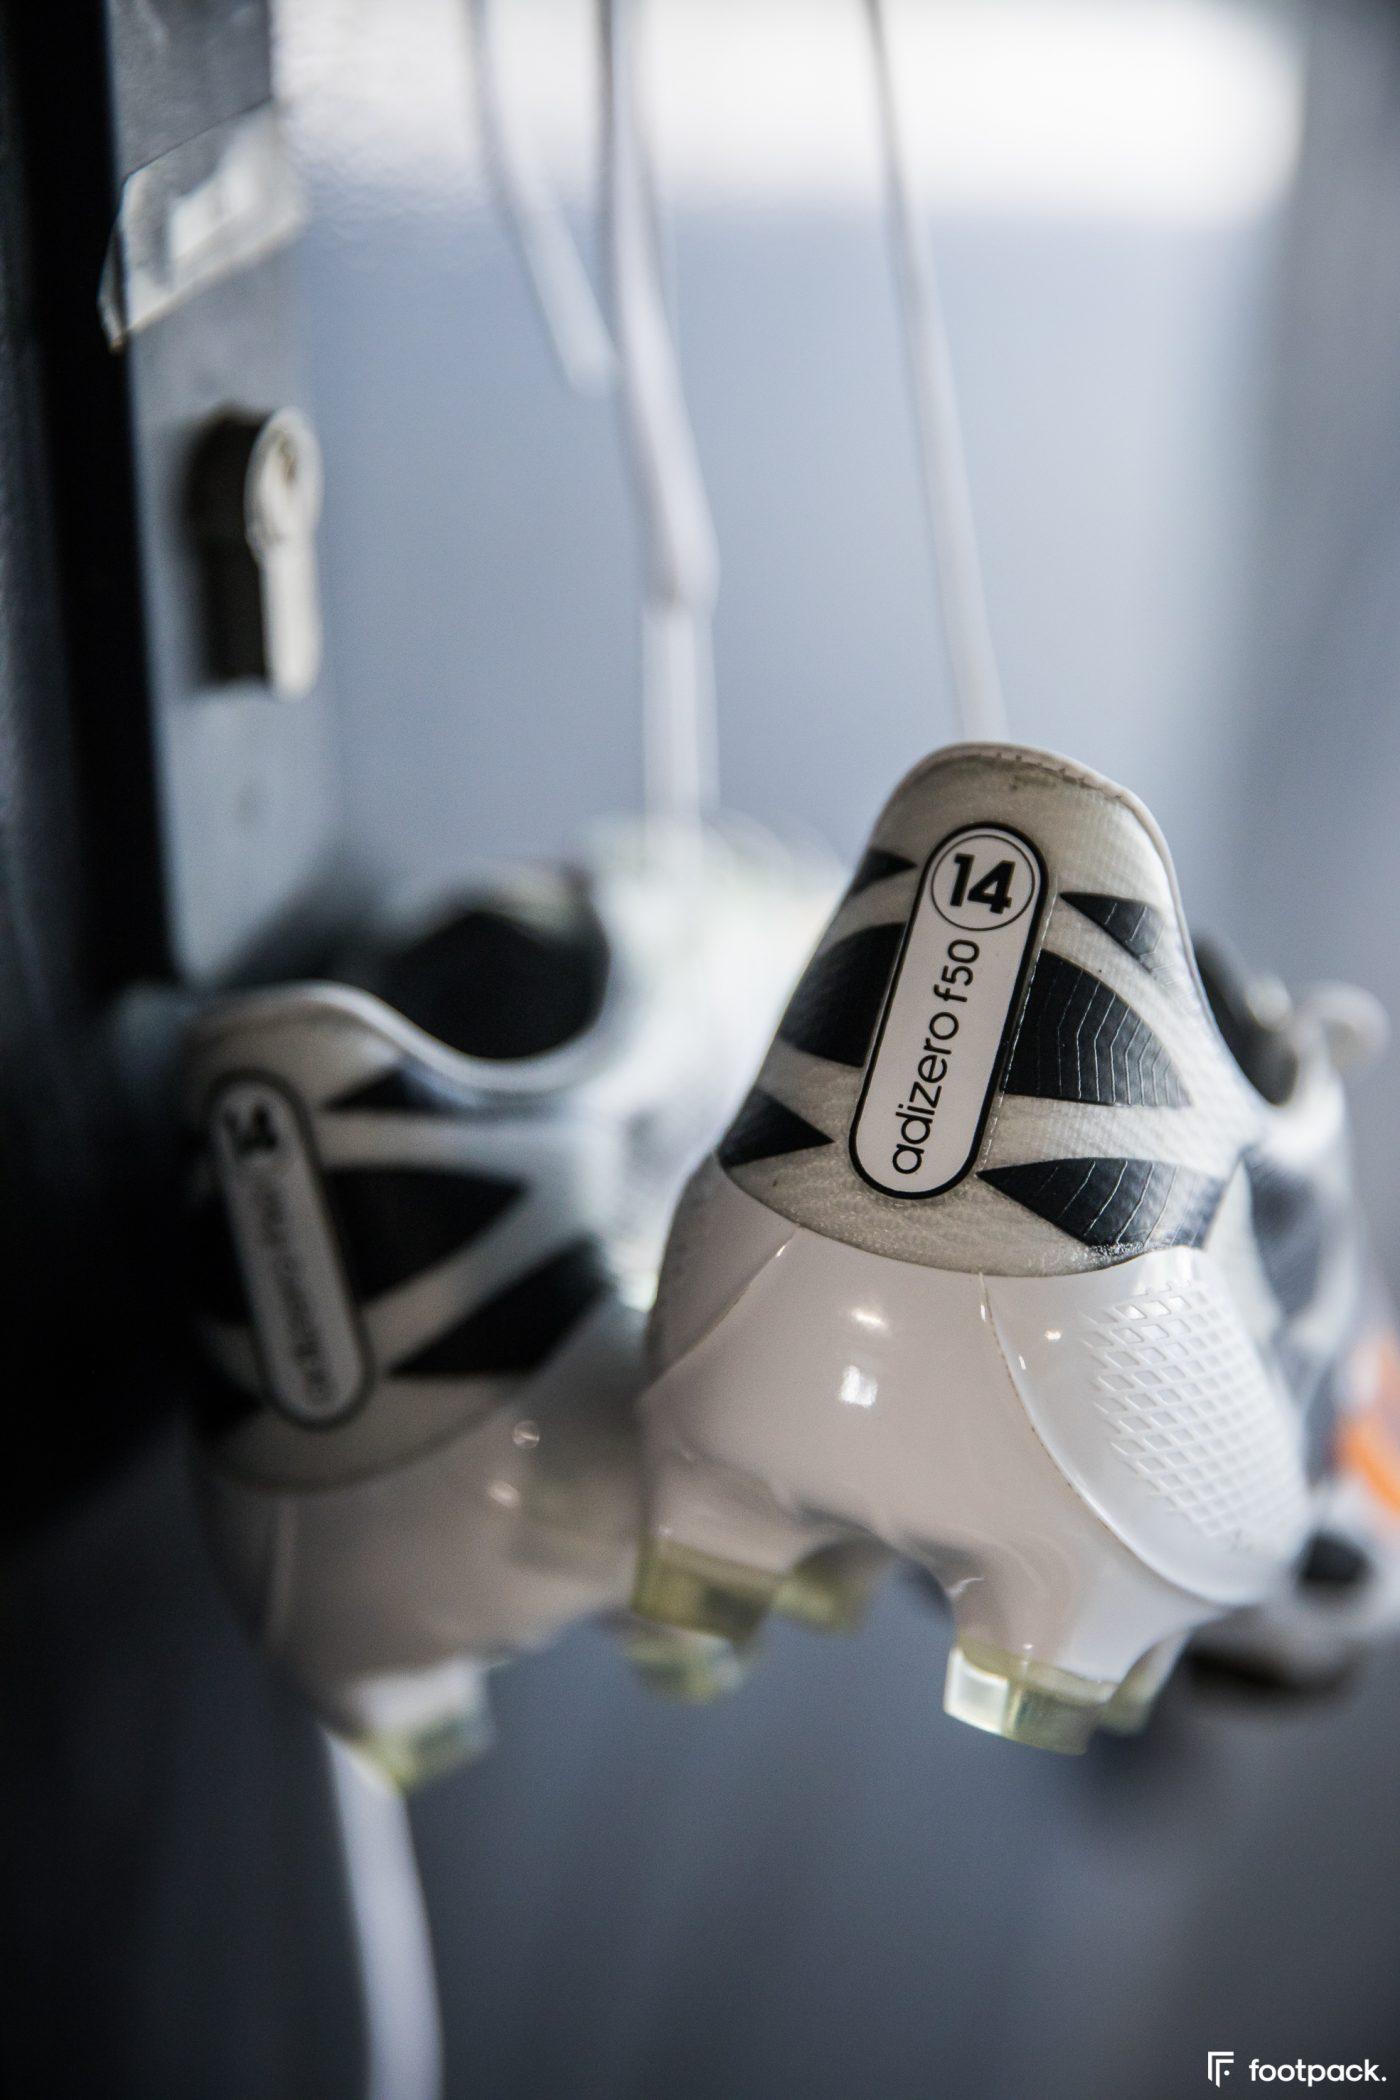 adidas-F50-adizero-battle-pack-coupe-du-monde-2014-footpack-7